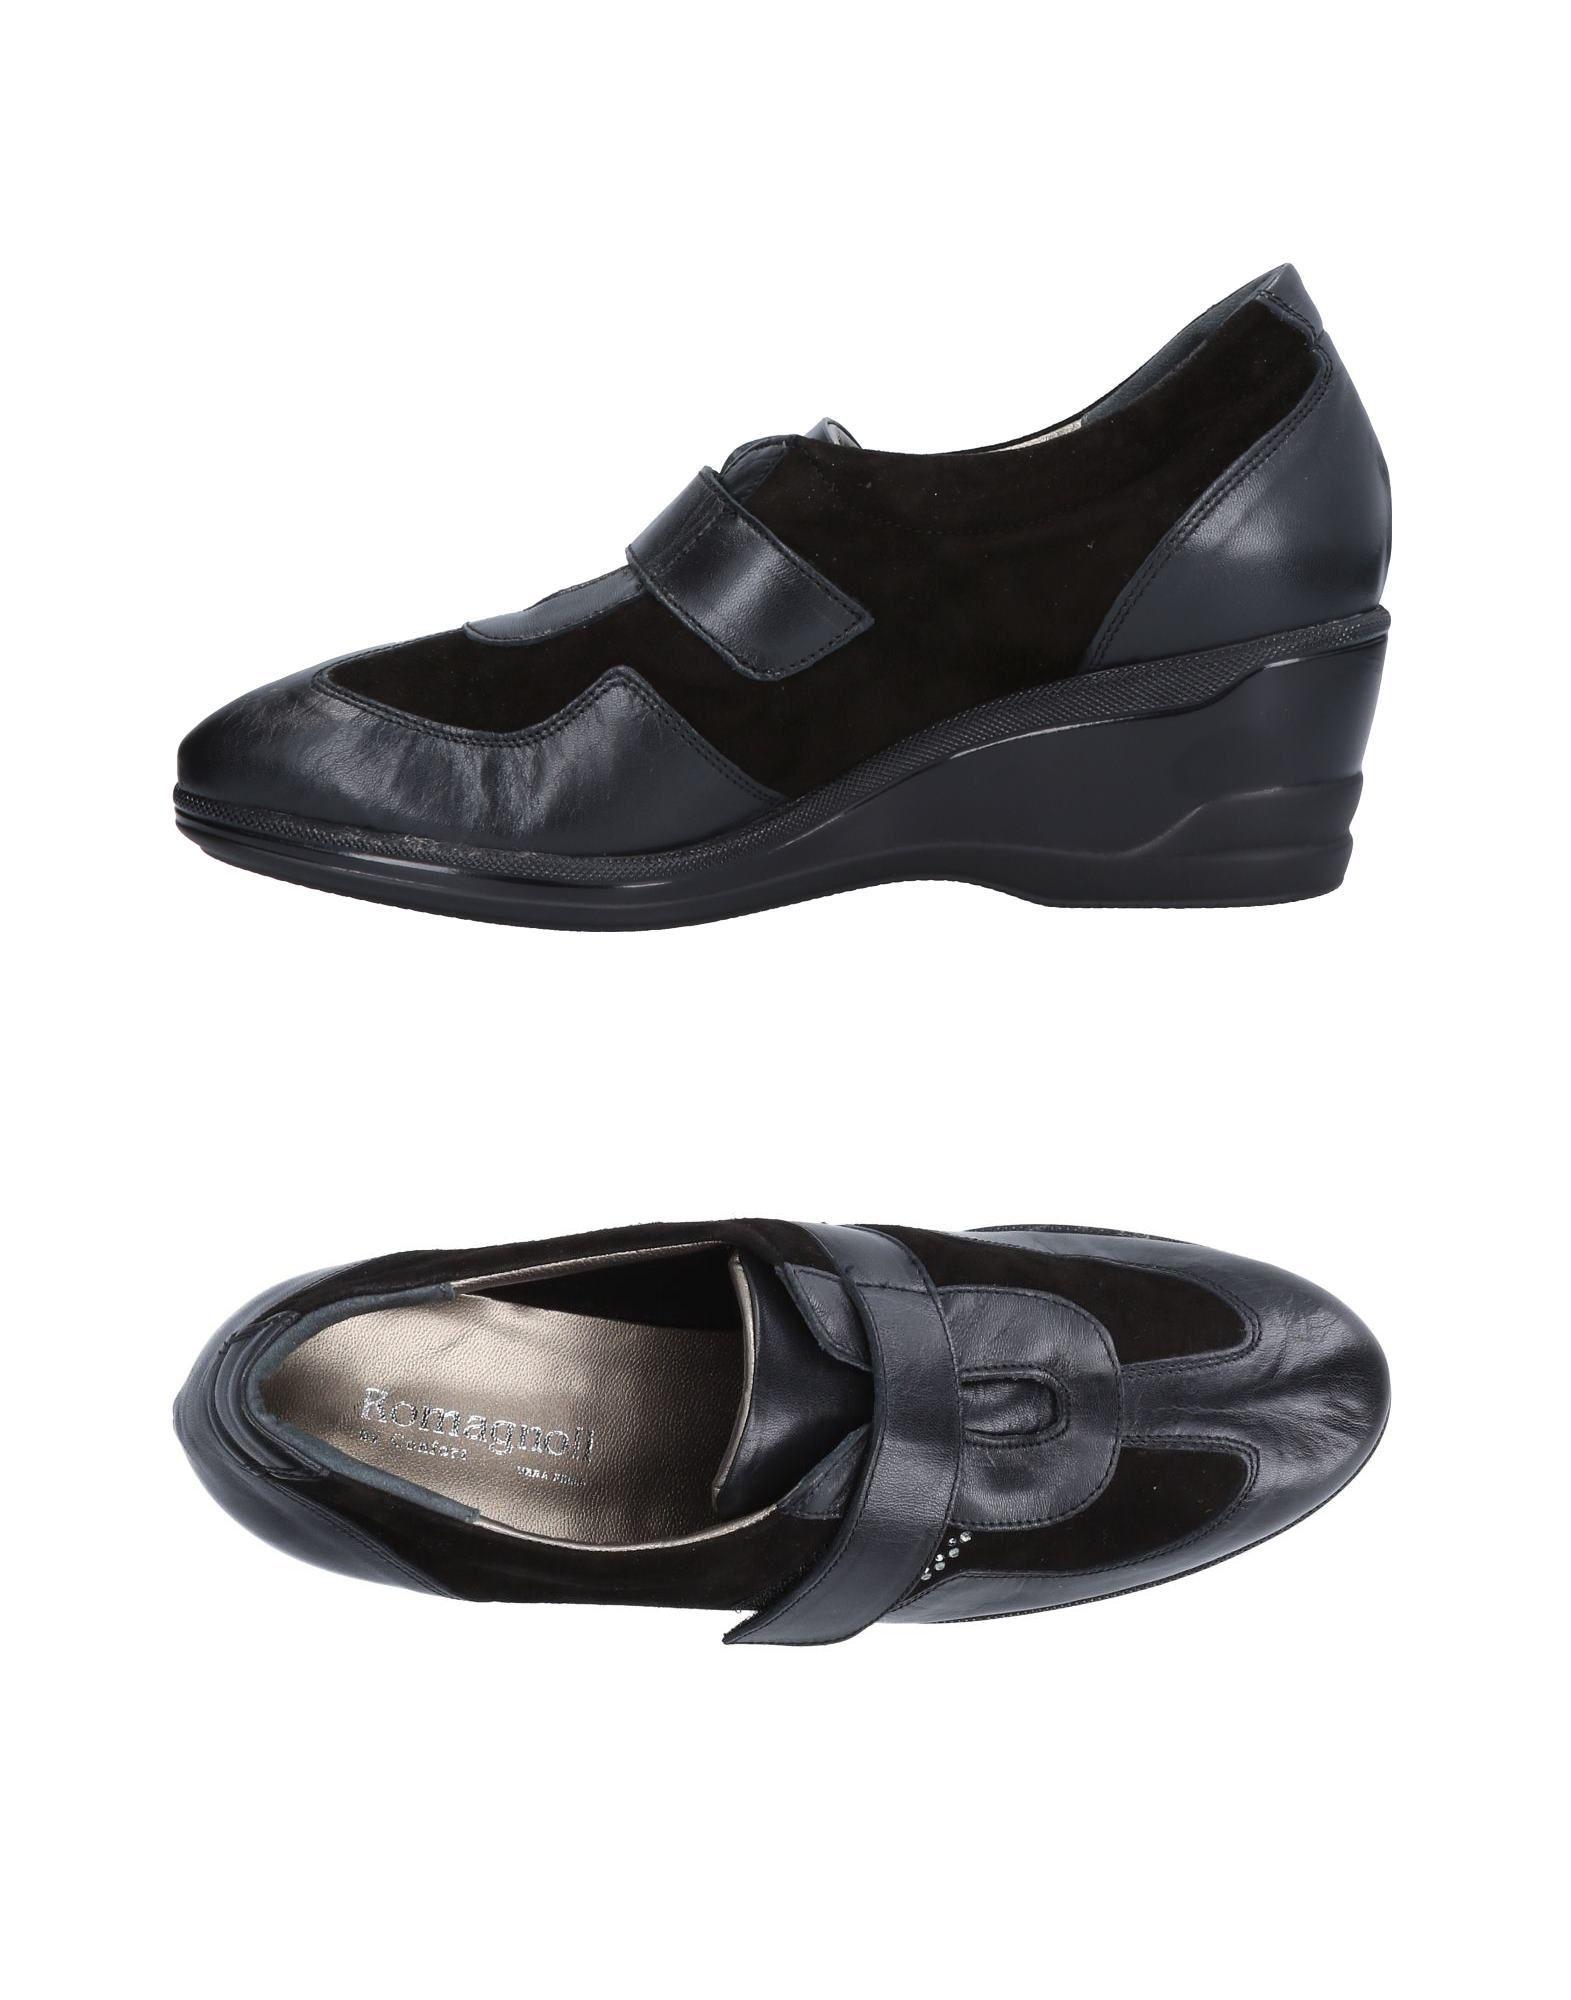 Romagnoli Gute Sneakers Damen  11514196QH Gute Romagnoli Qualität beliebte Schuhe 88eaf8